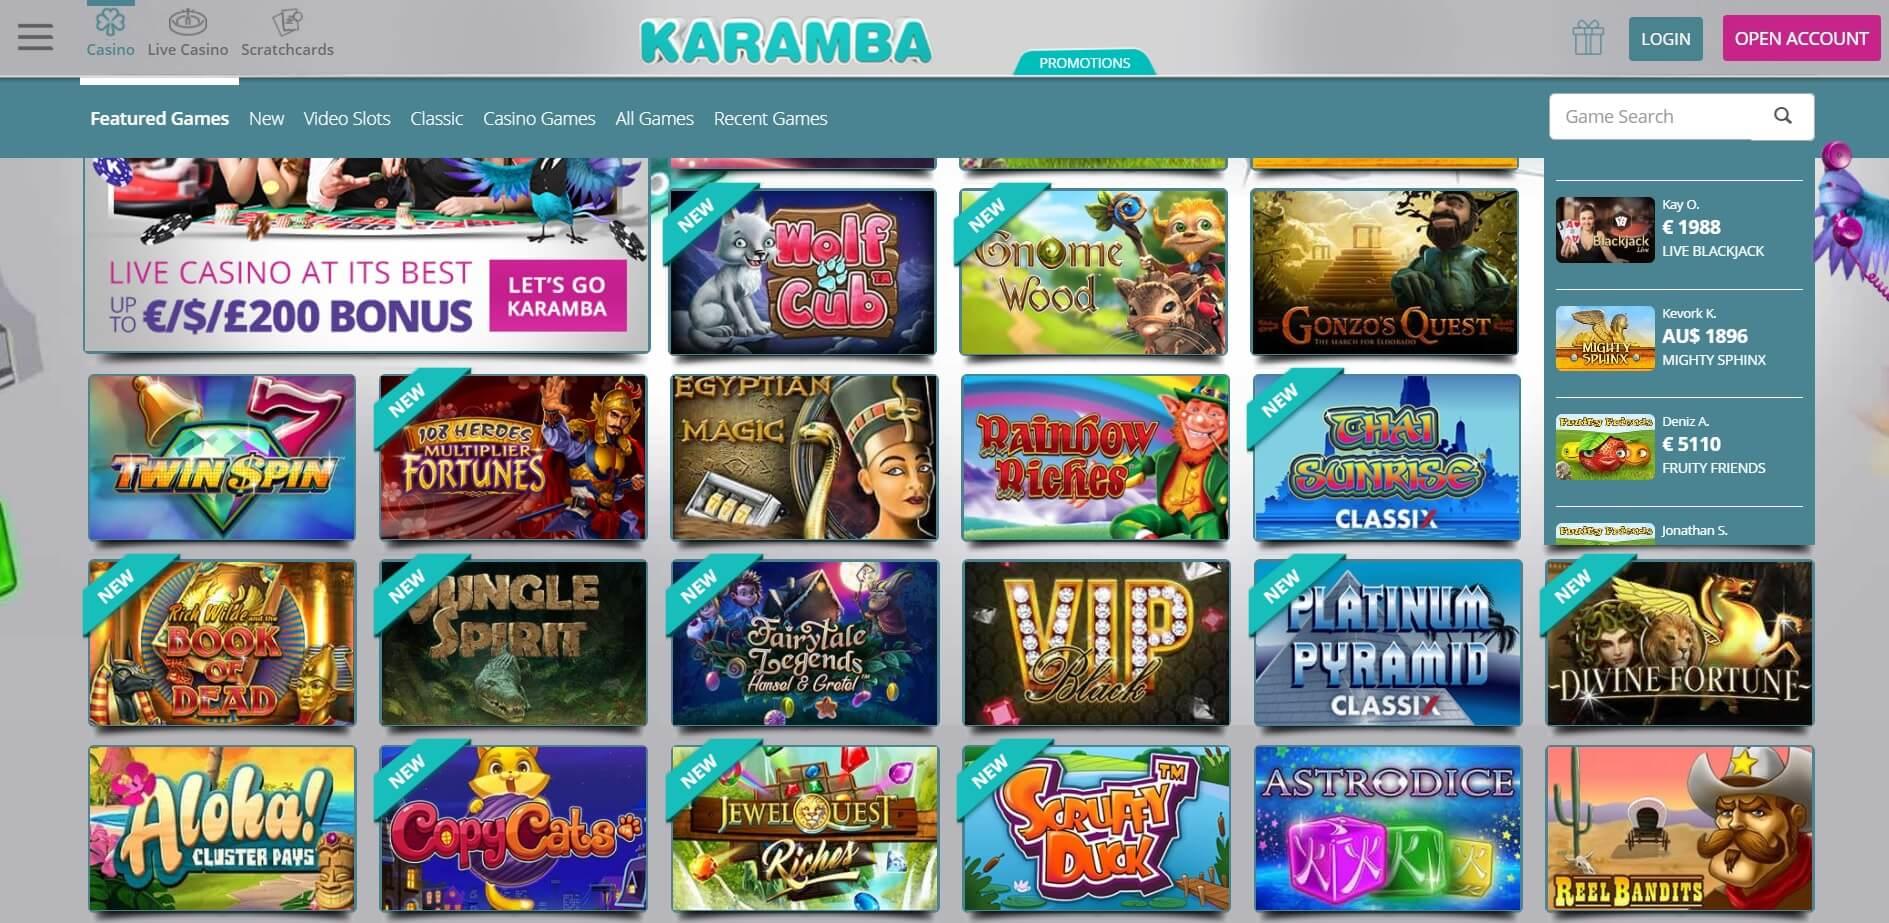 Latest karamba casino no deposit bonuses 🥇 april